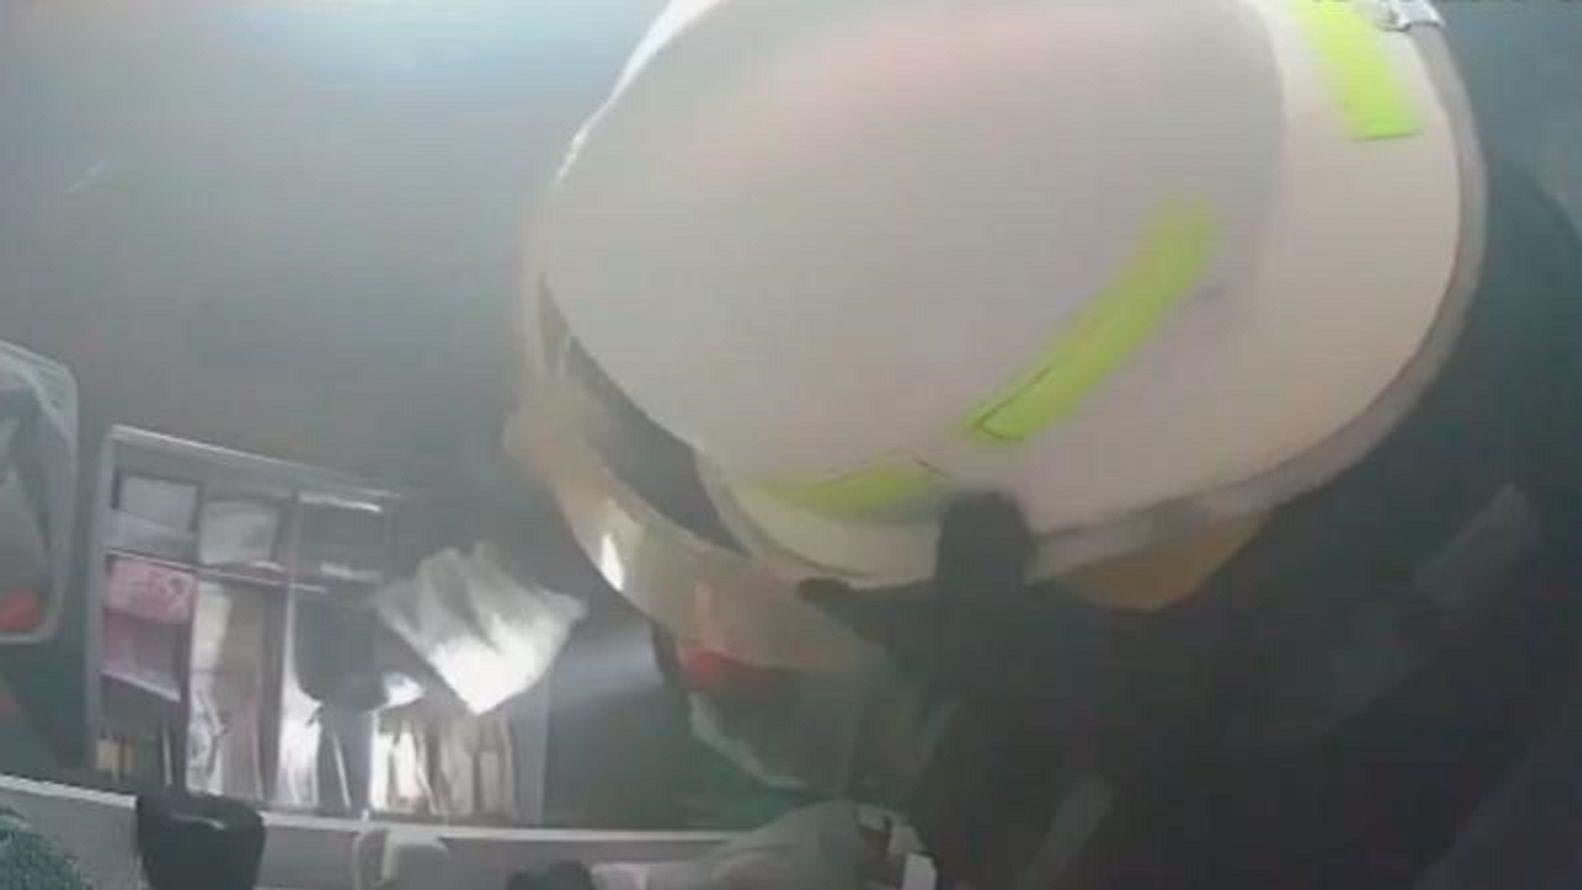 Córdoba: un bombero robó en un negocio mientras apagaba un incendio